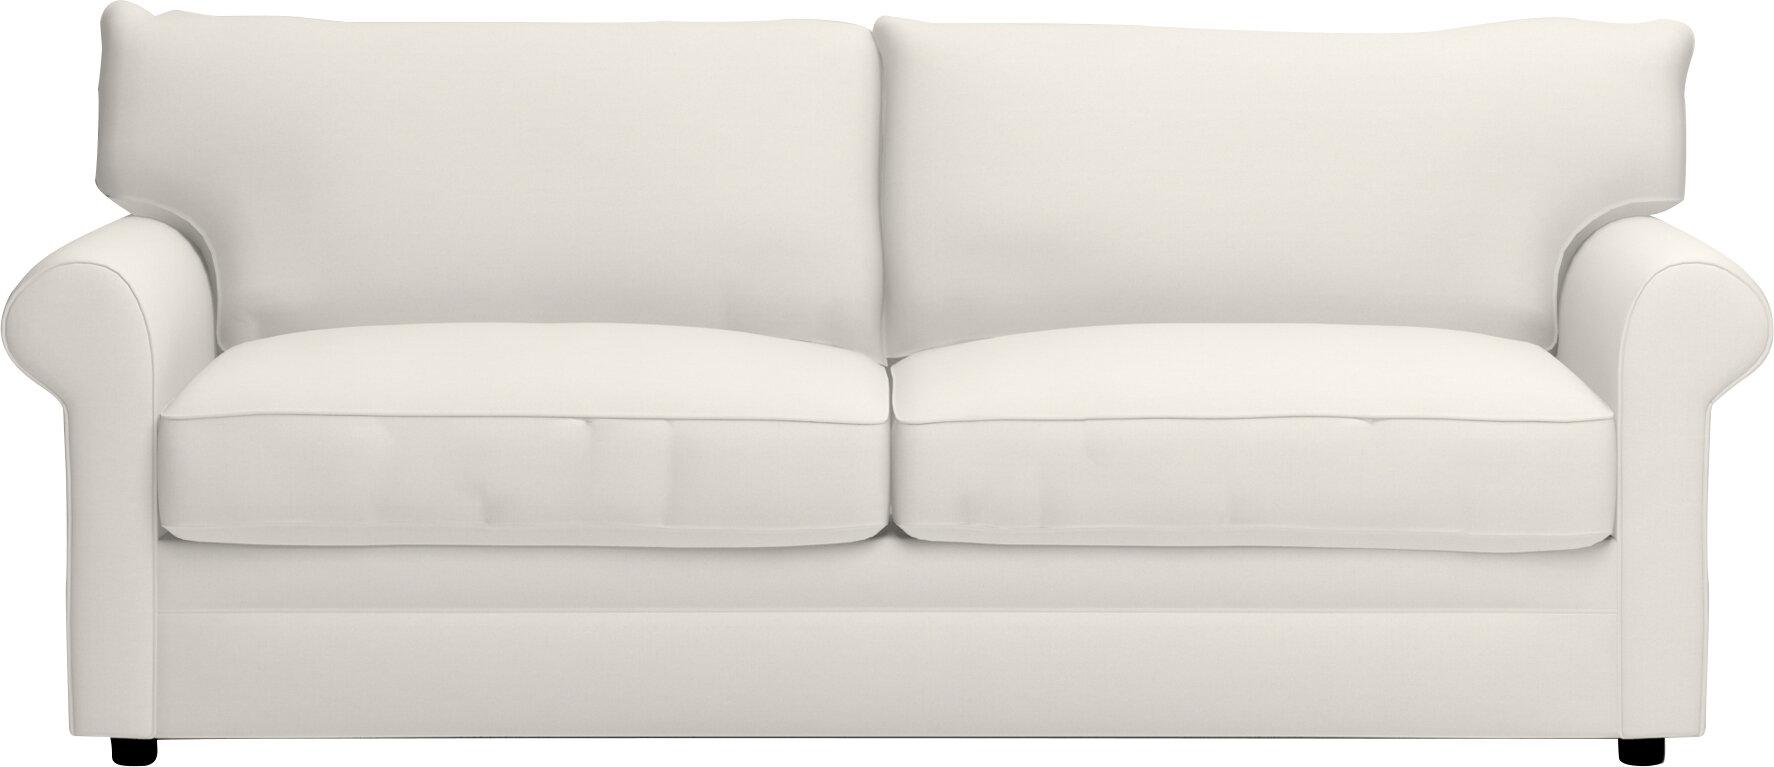 ls sleeper products furniture carl bed sw charcoal chair sq jennifer sofa